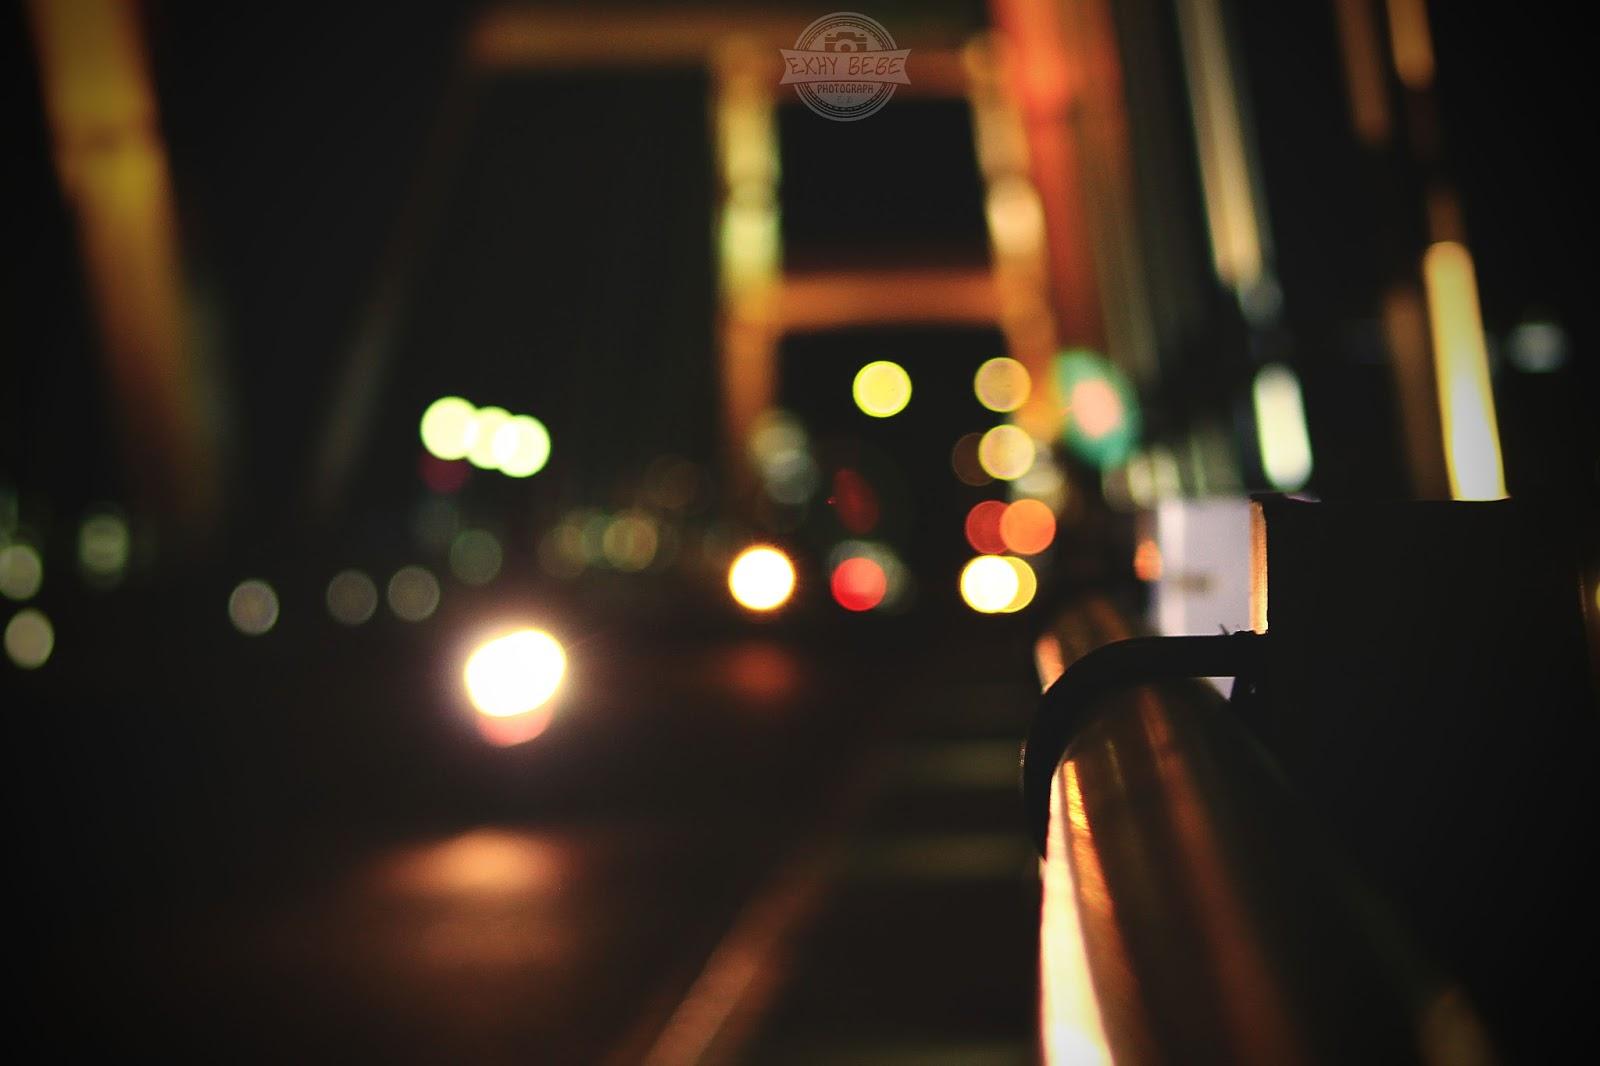 Galeri Photo Jembatan 4 Kota Palu Sulawesi Tengah Iv